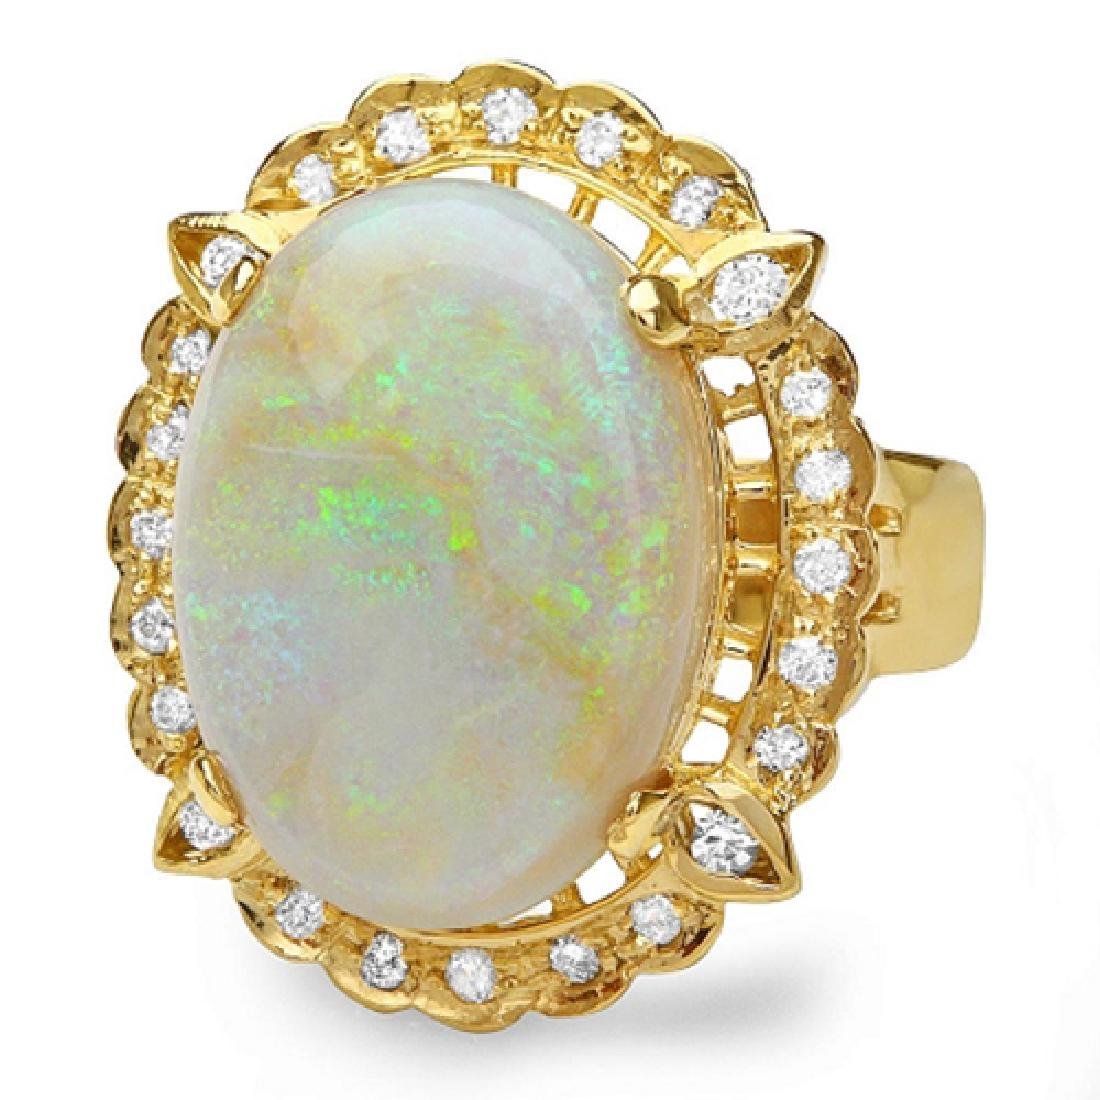 12.38 Carat Natural Opal 18K Solid Yellow Gold Diamond - 2